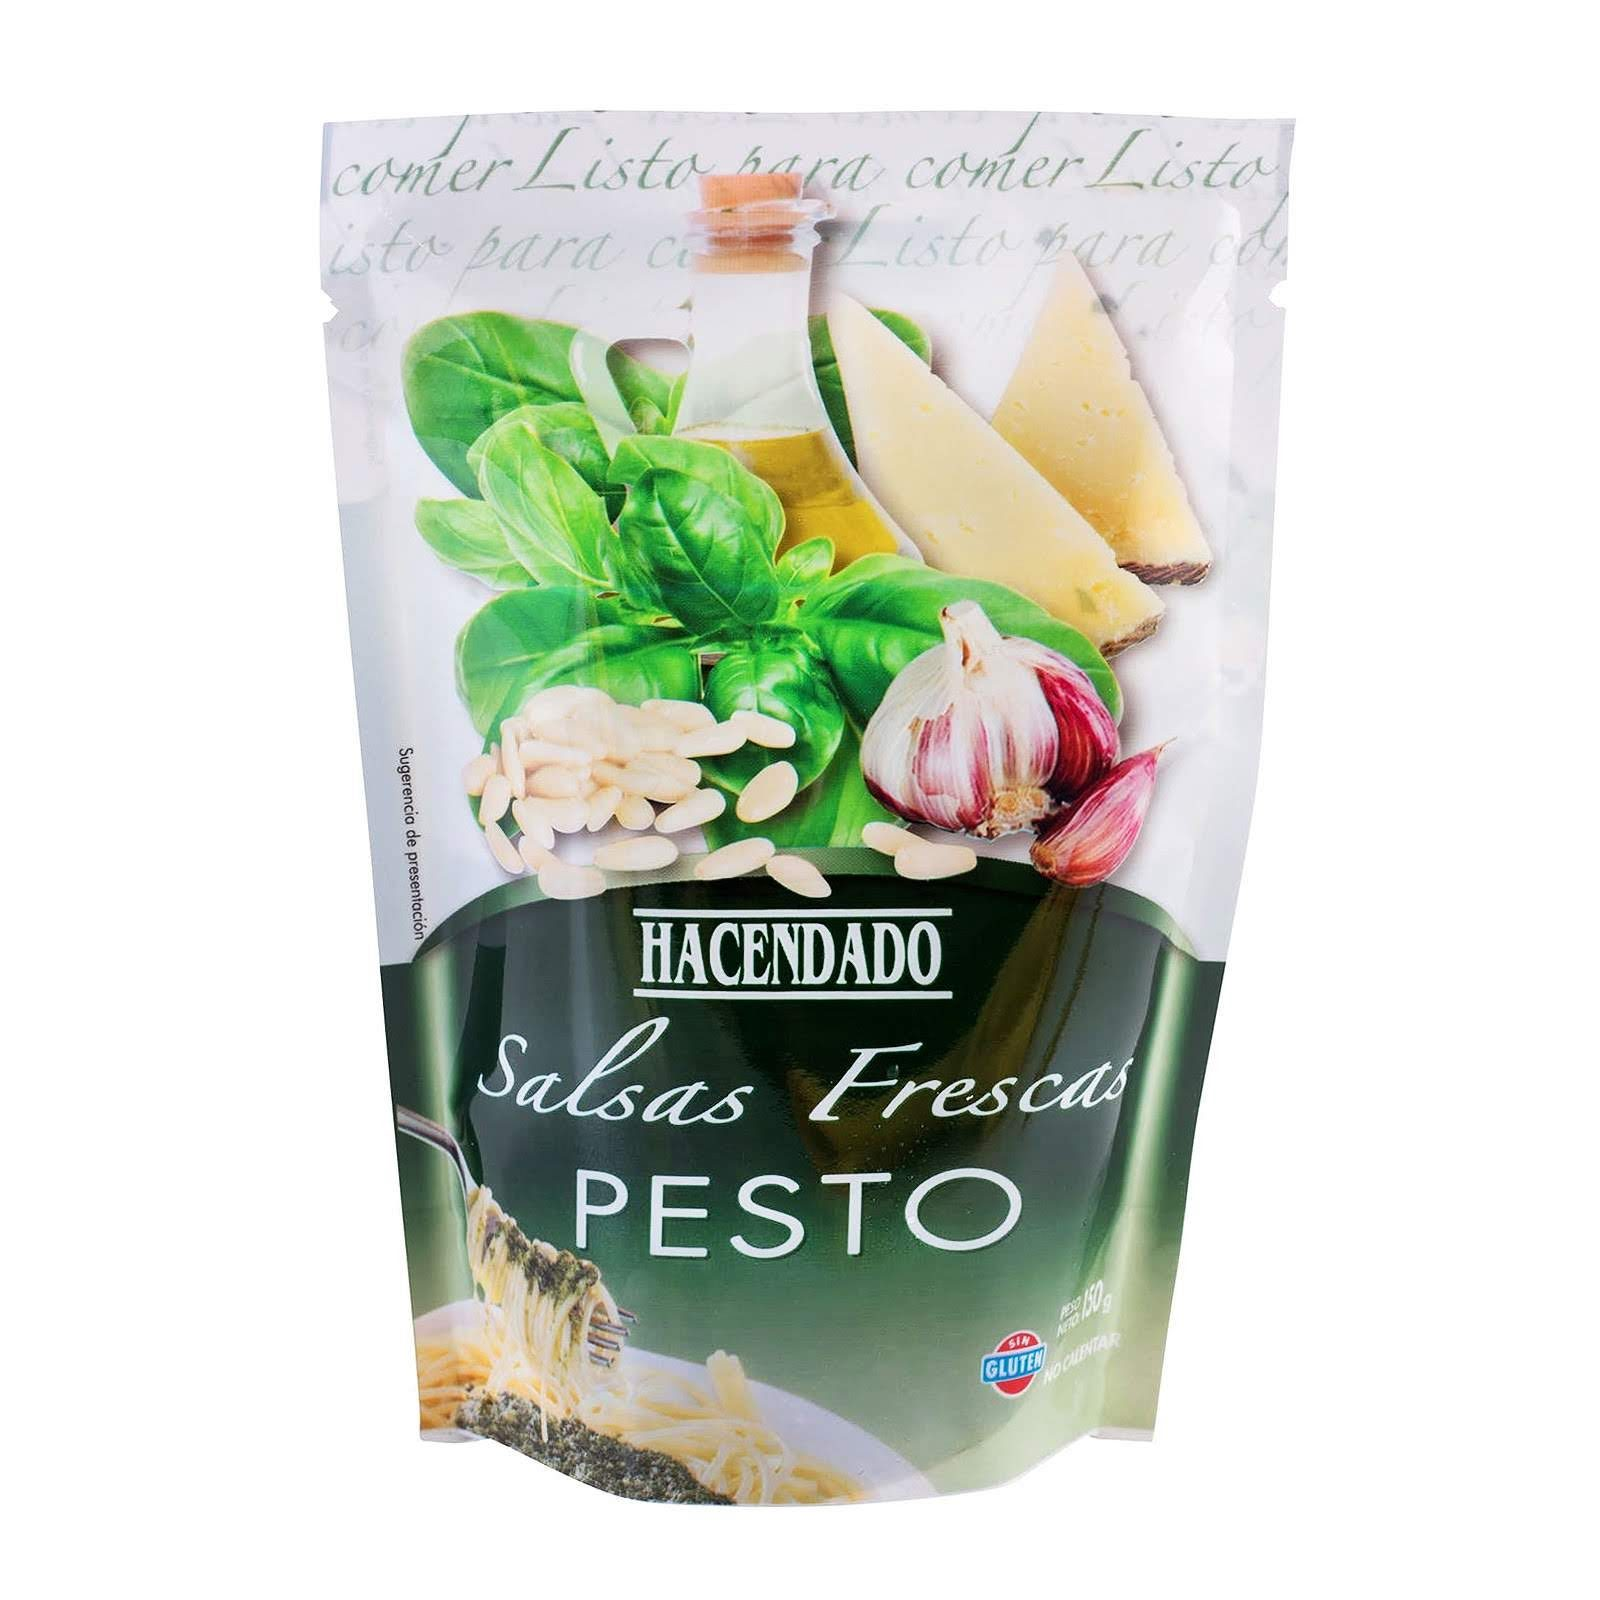 salsa-fresca-pesto-hacendado-mercadona-1-6564281